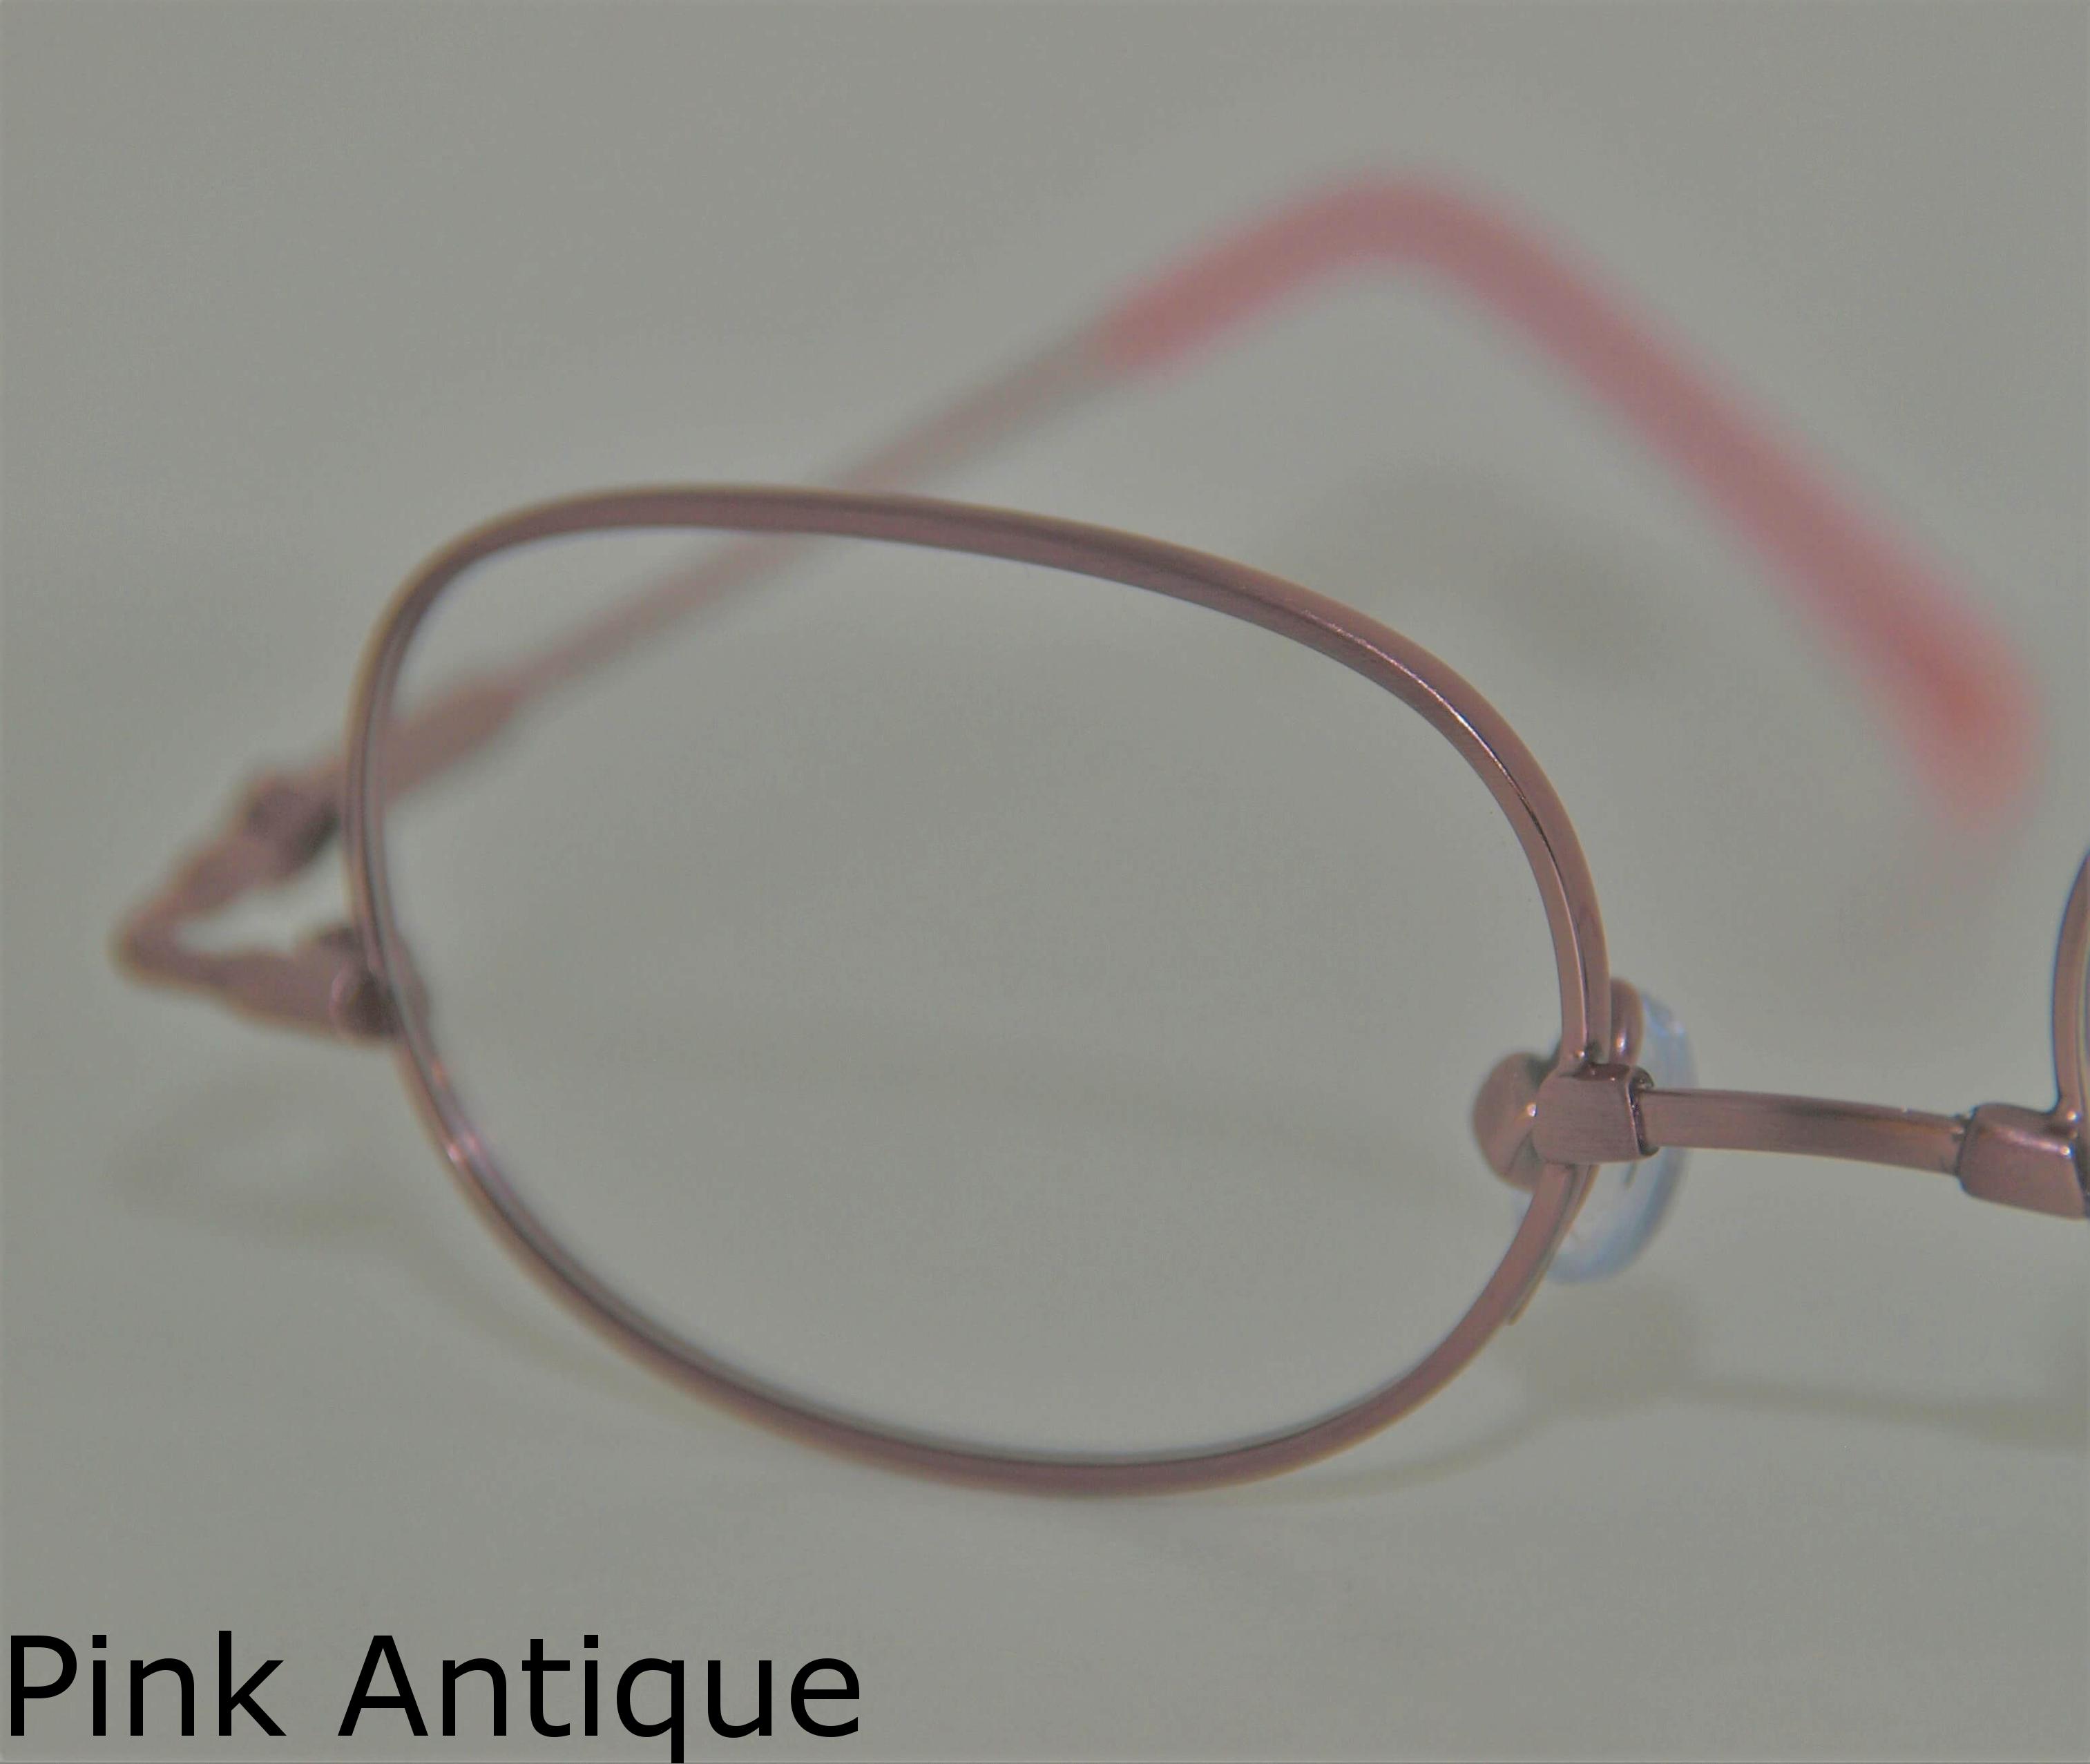 - Pink-Antique